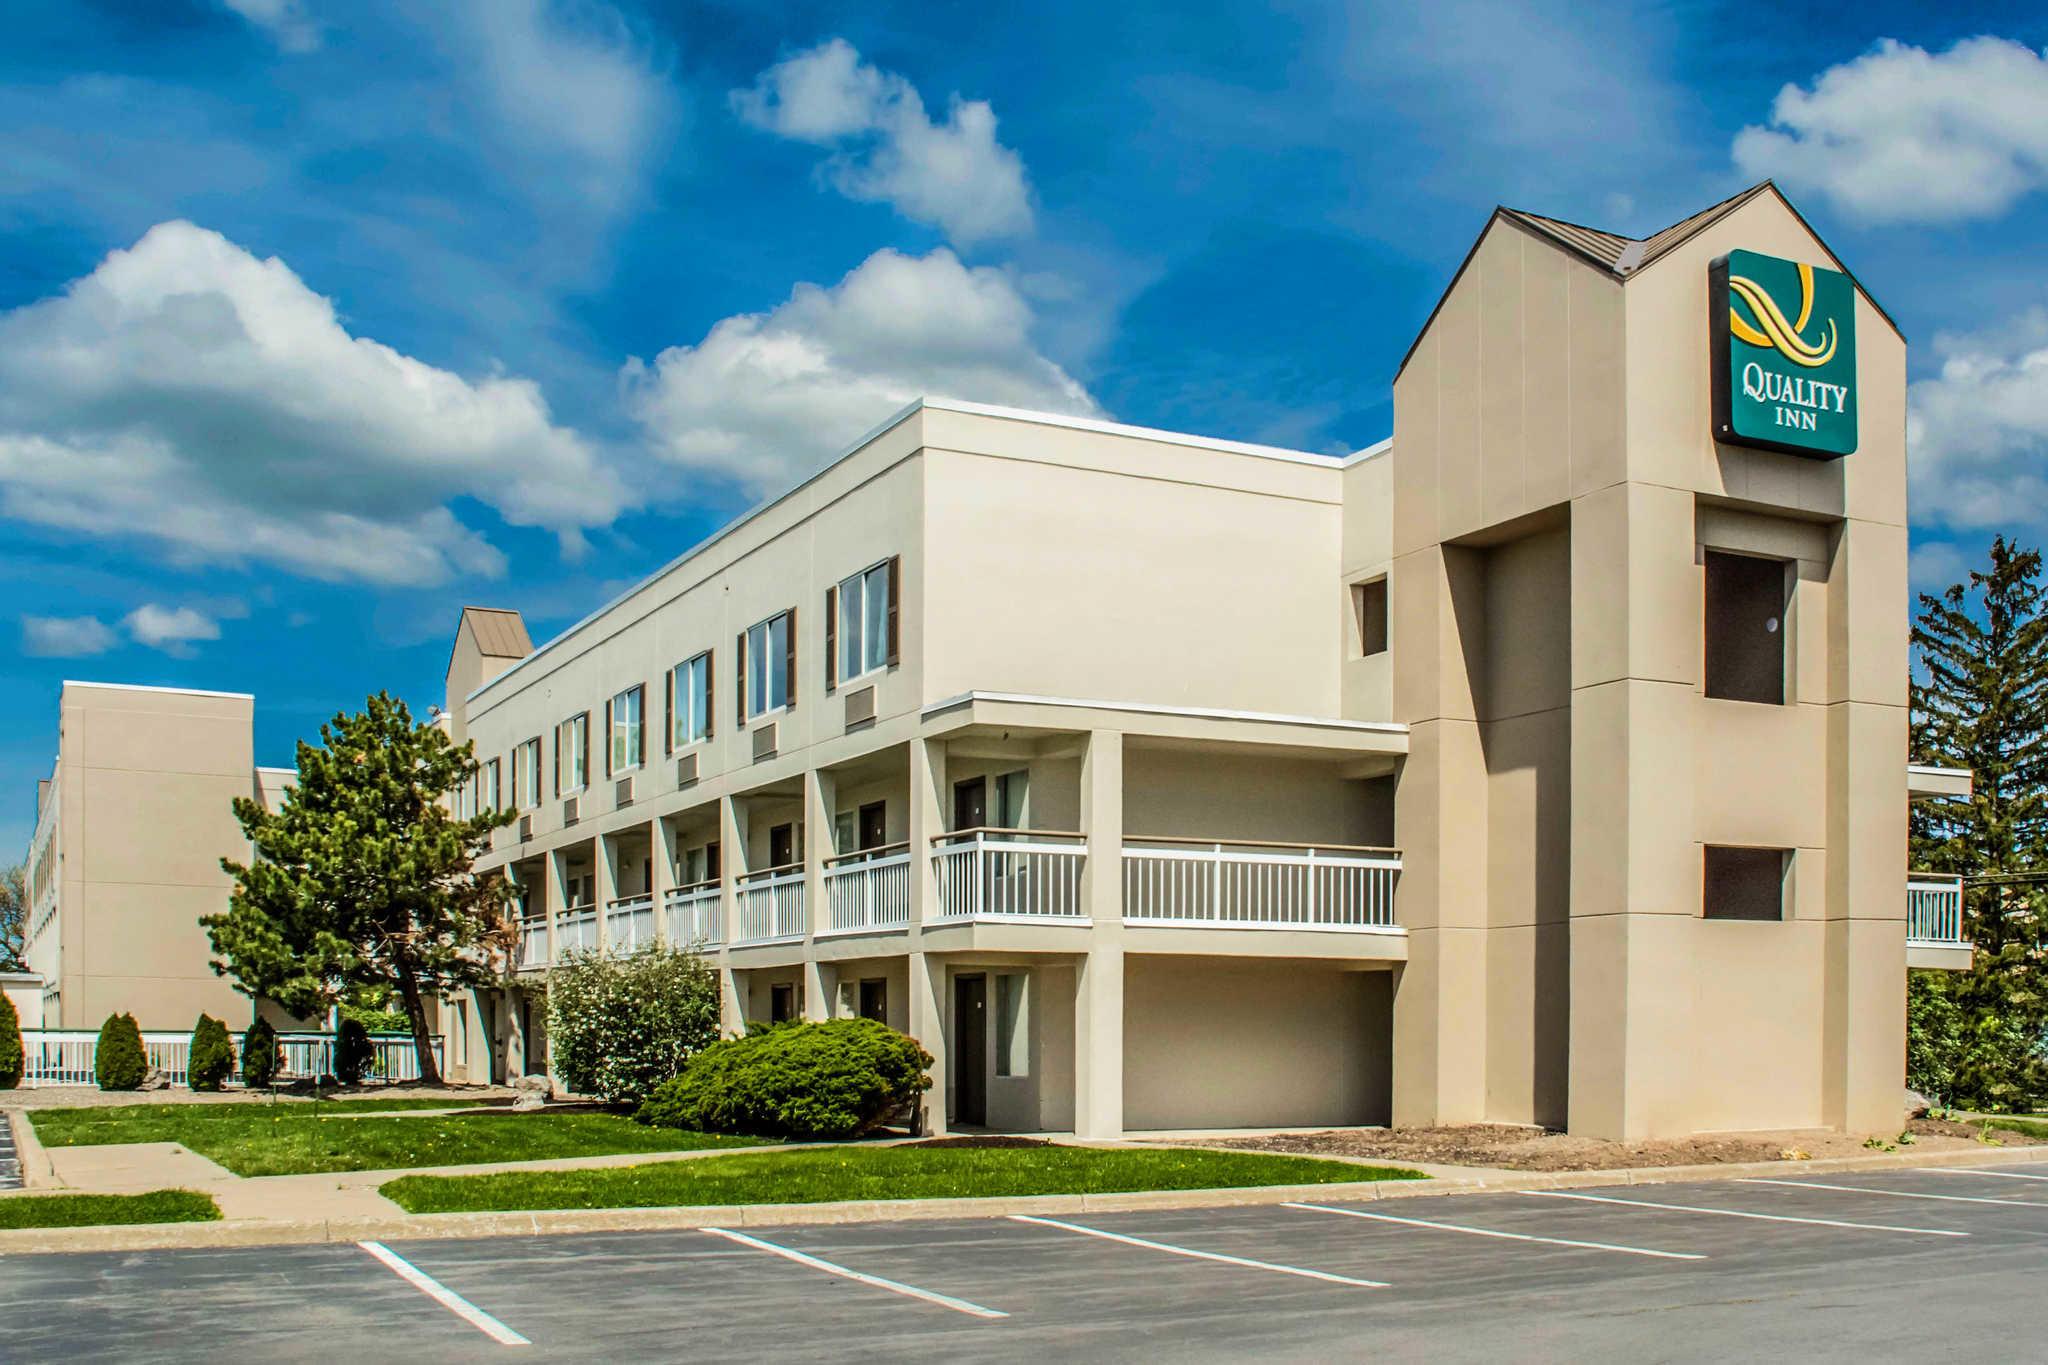 Quality Inn Syracuse Carrier Circle image 2